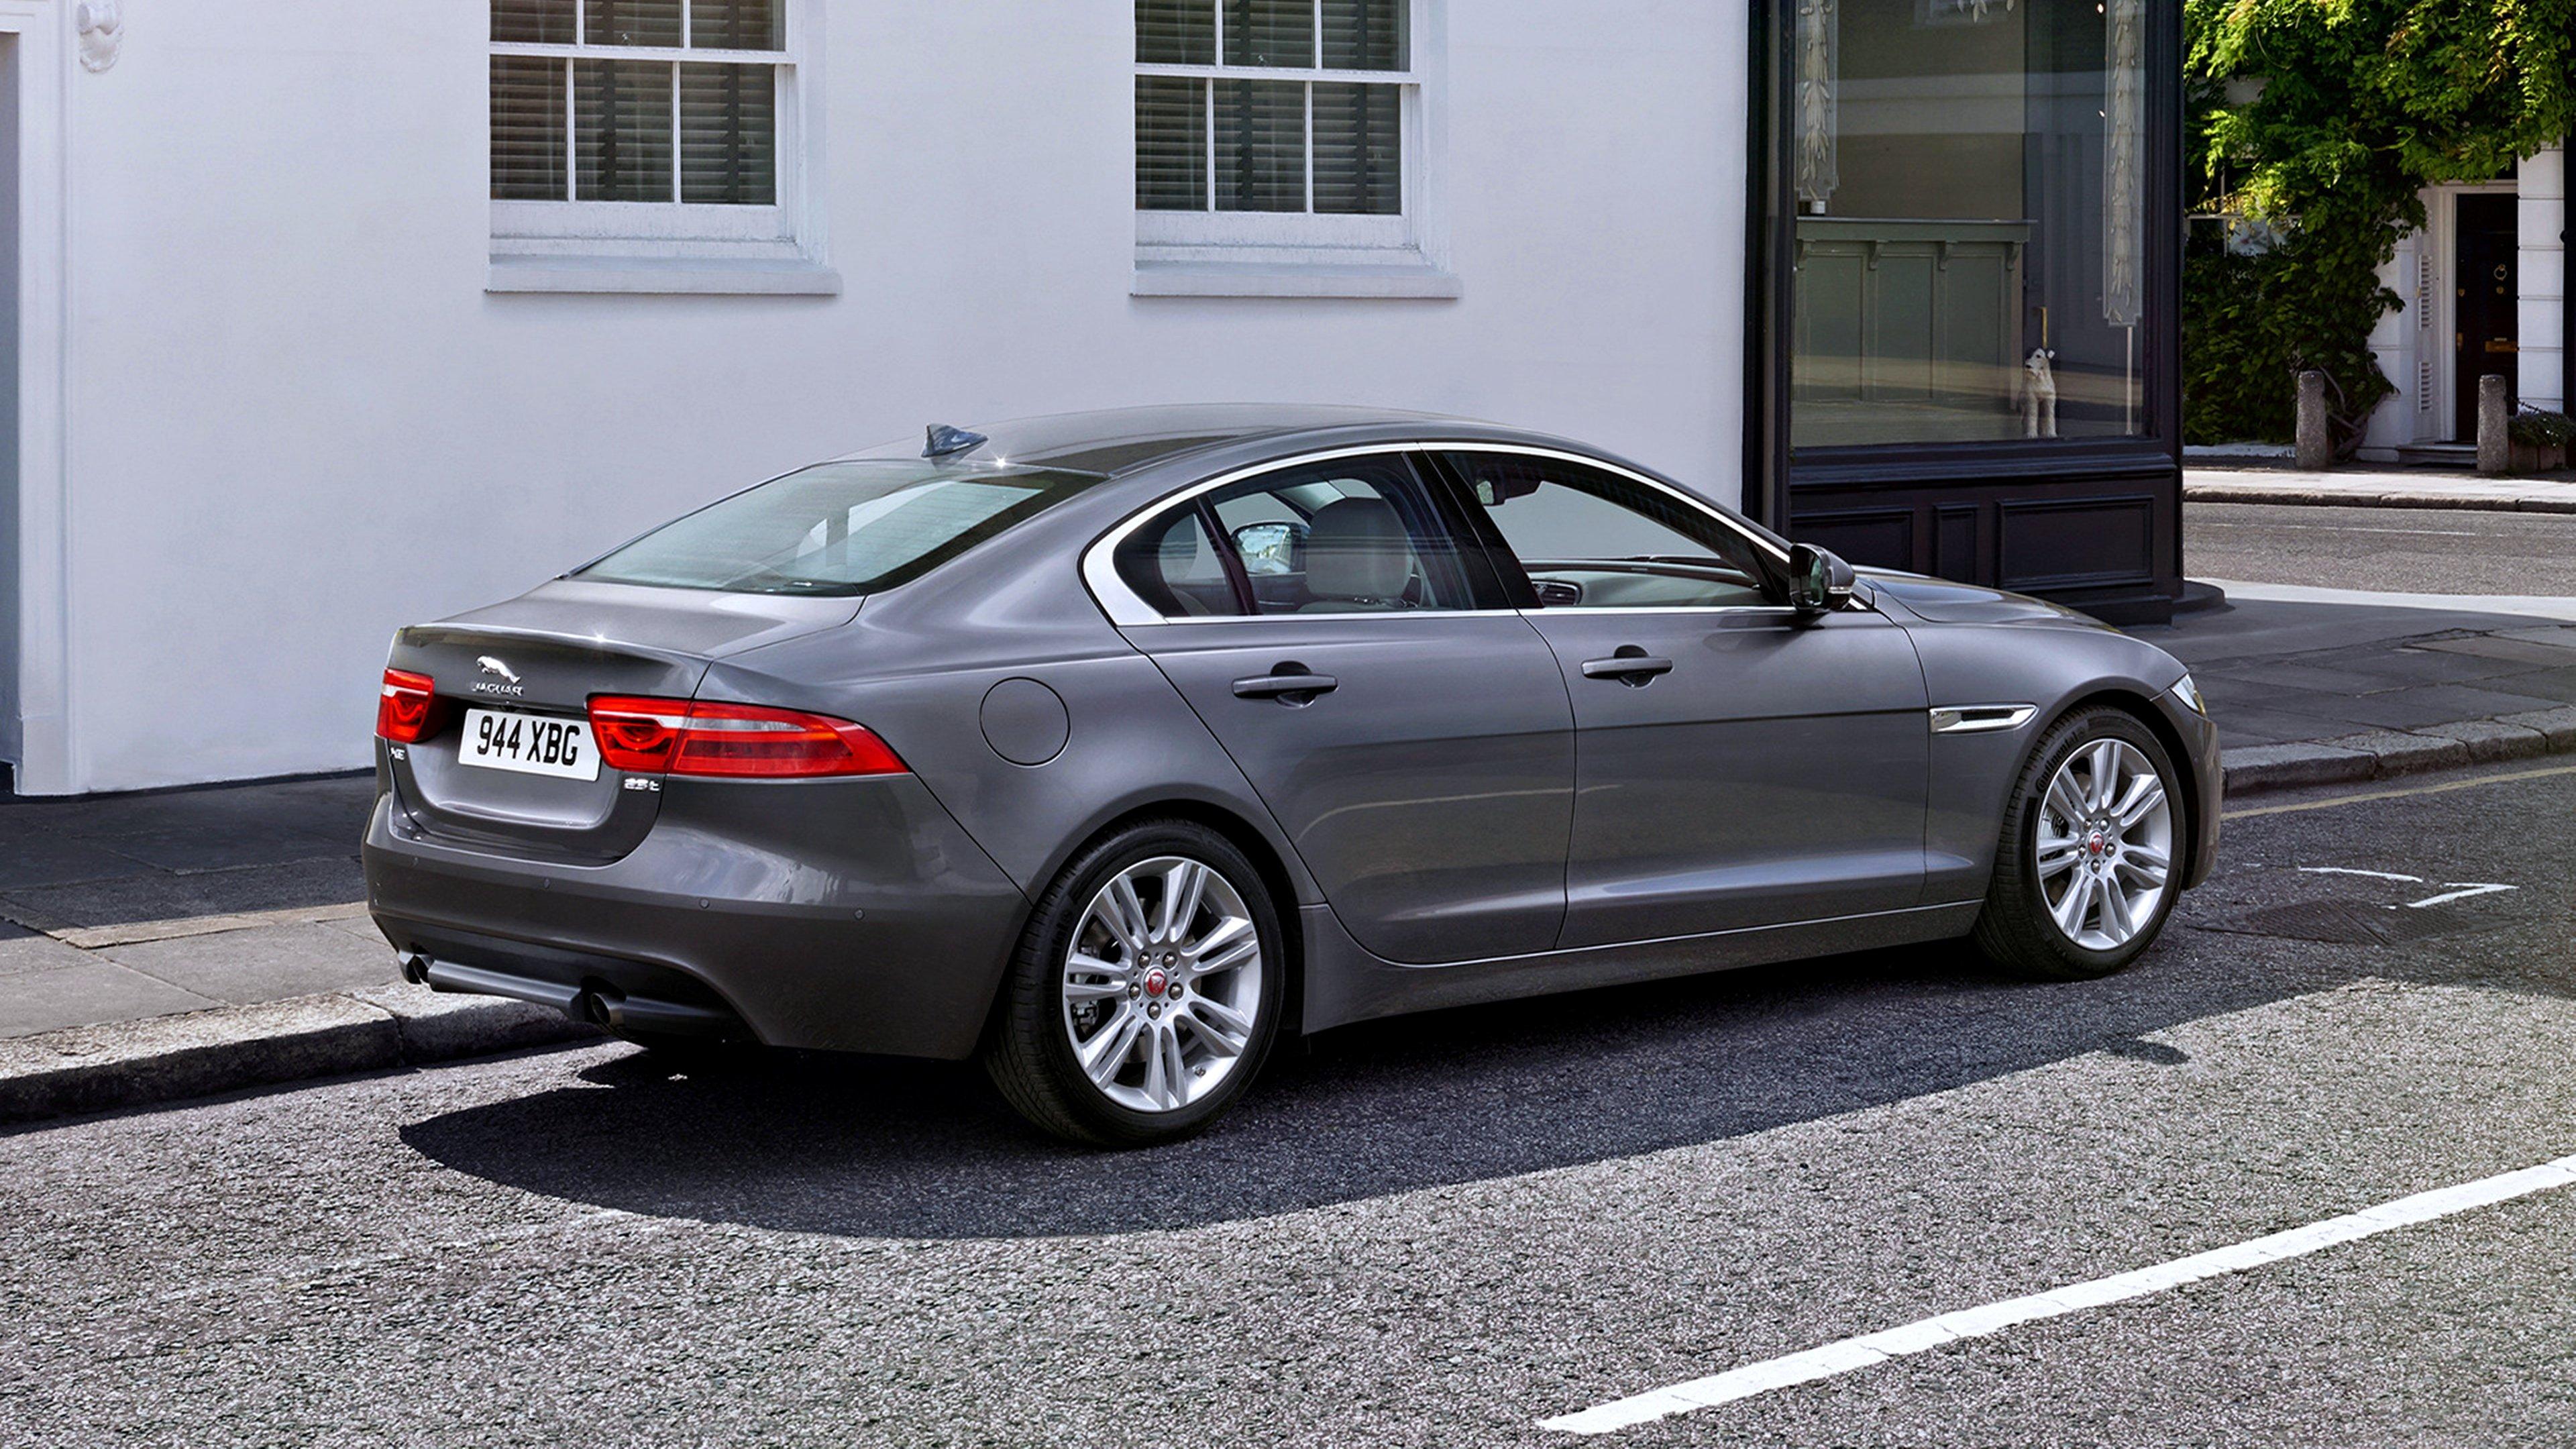 Exterior Preview: 2015 Jaguar XE (Grey)